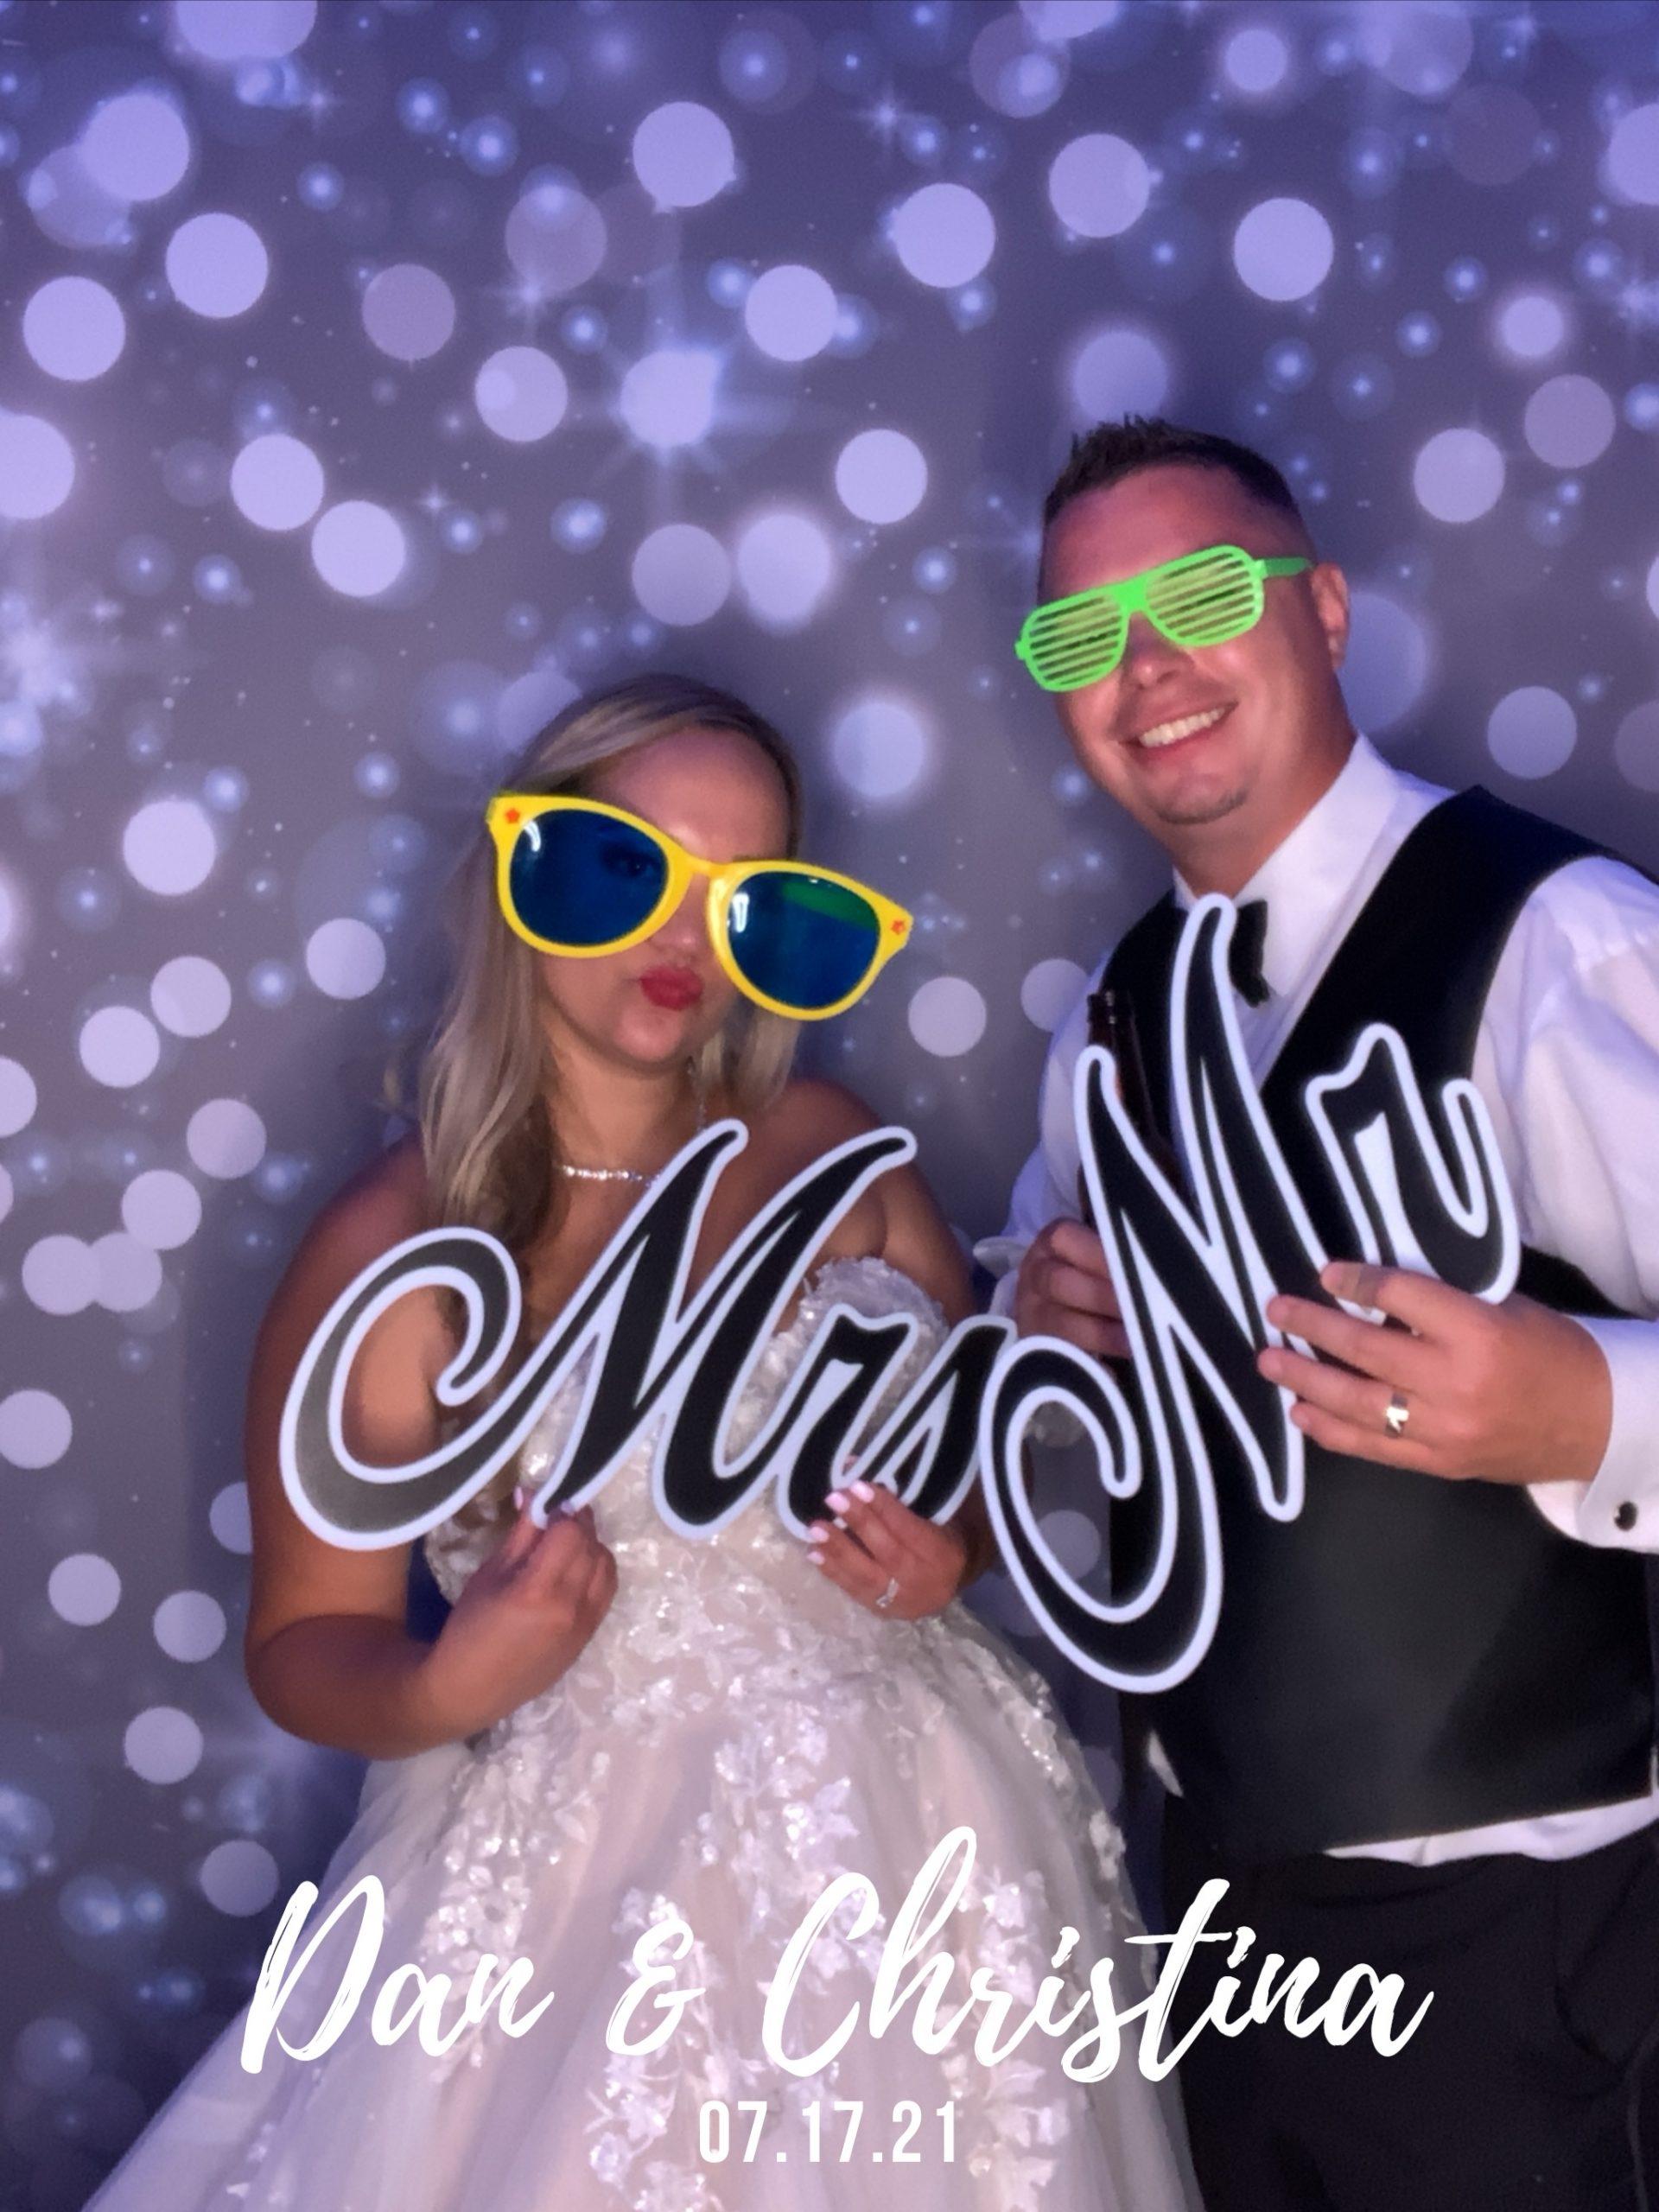 Dan_Christinas_Wedding!_photo_140